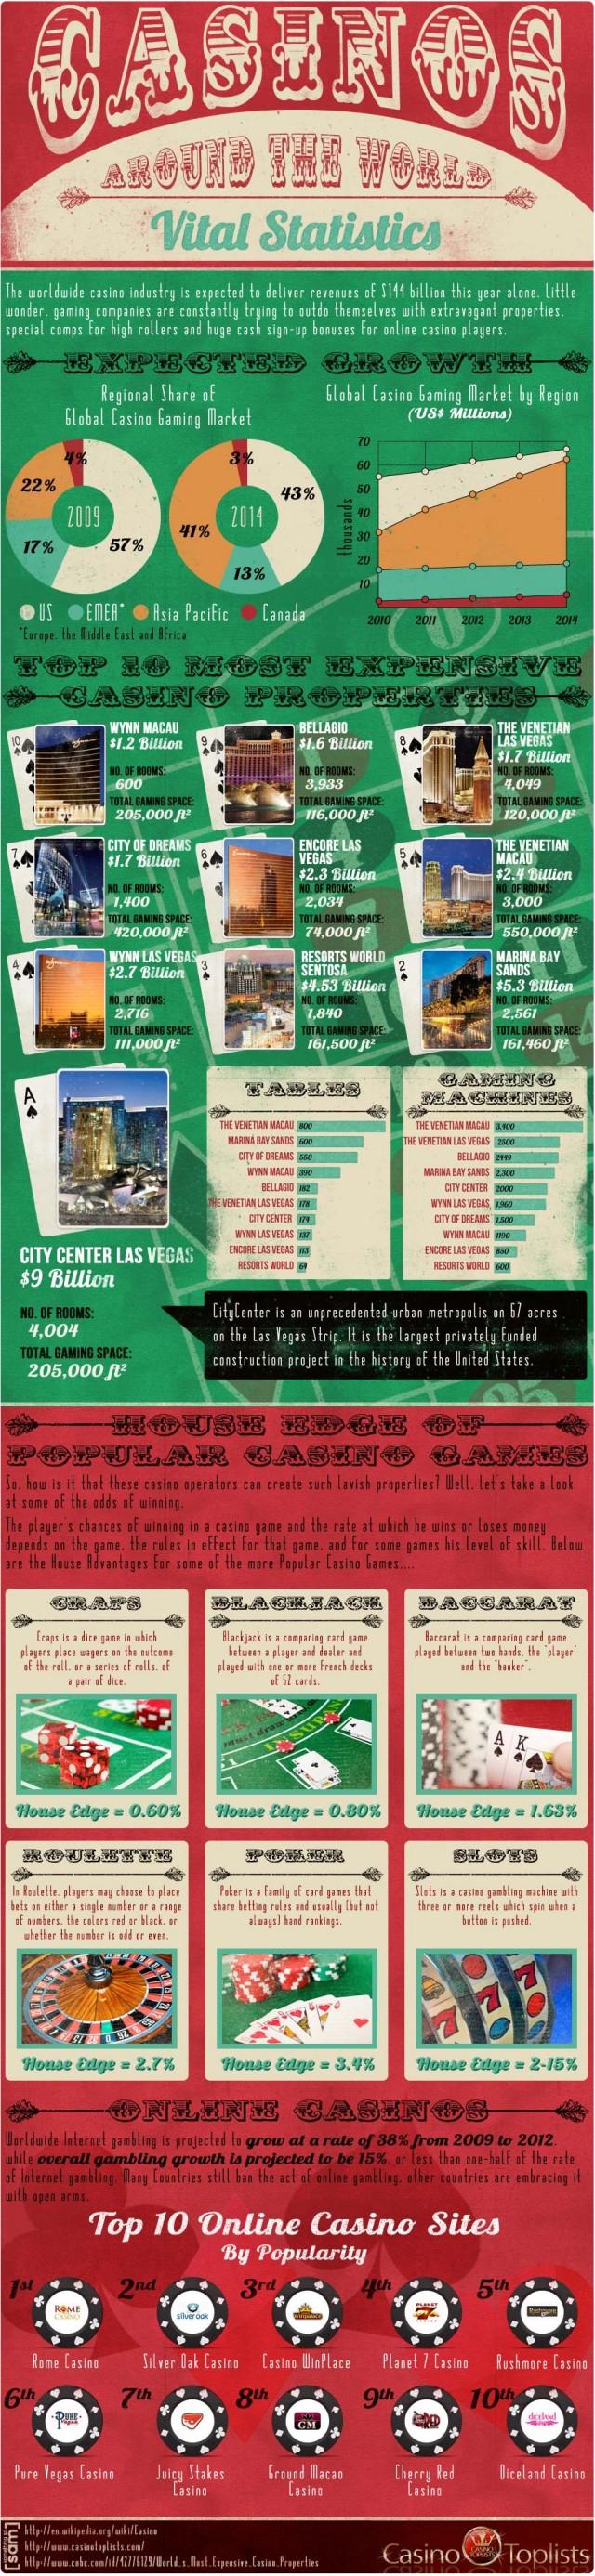 Global Casino Statistics